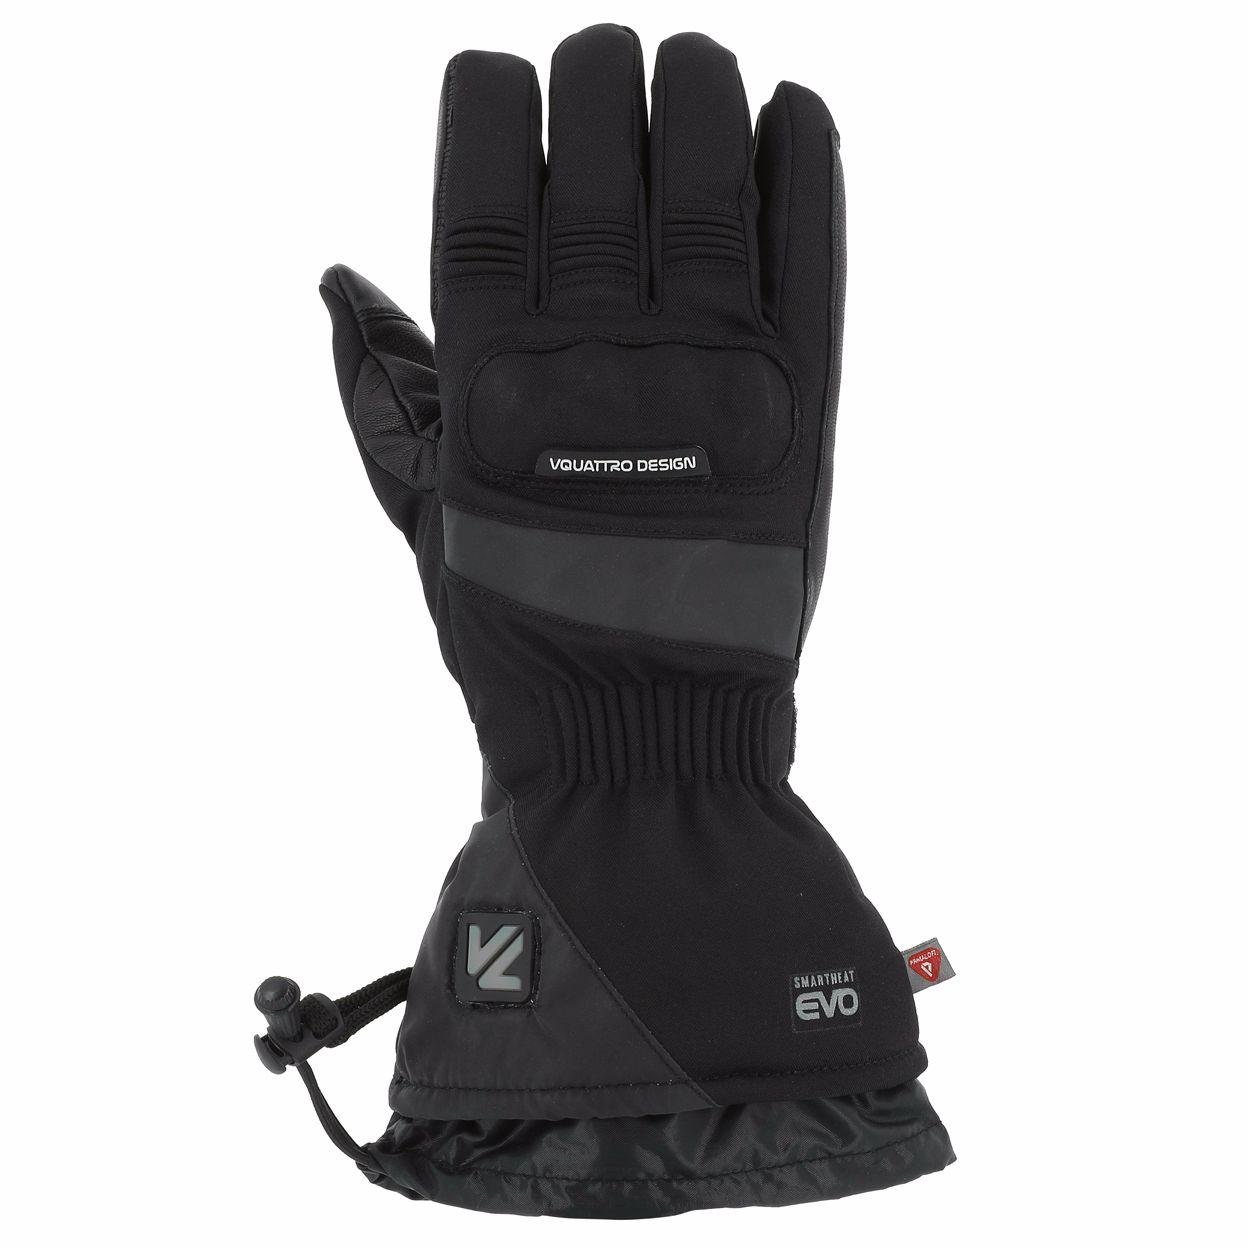 gants v quattro alpha gants moto. Black Bedroom Furniture Sets. Home Design Ideas